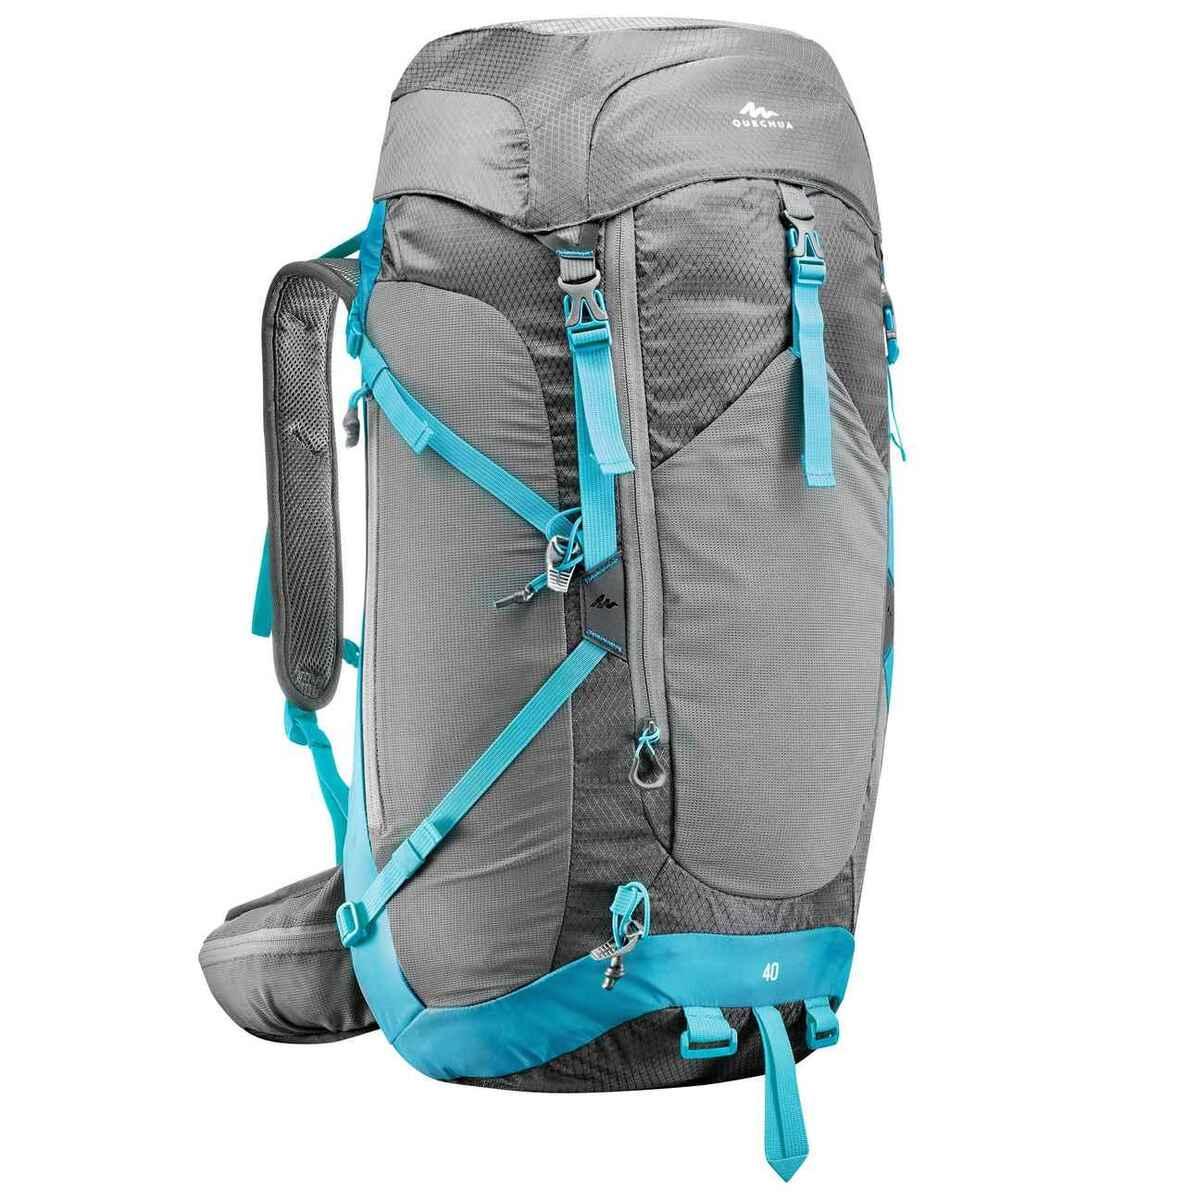 Bild 1 von Wanderrucksack Bergwandern MH500 40 Liter Damen grau/blau